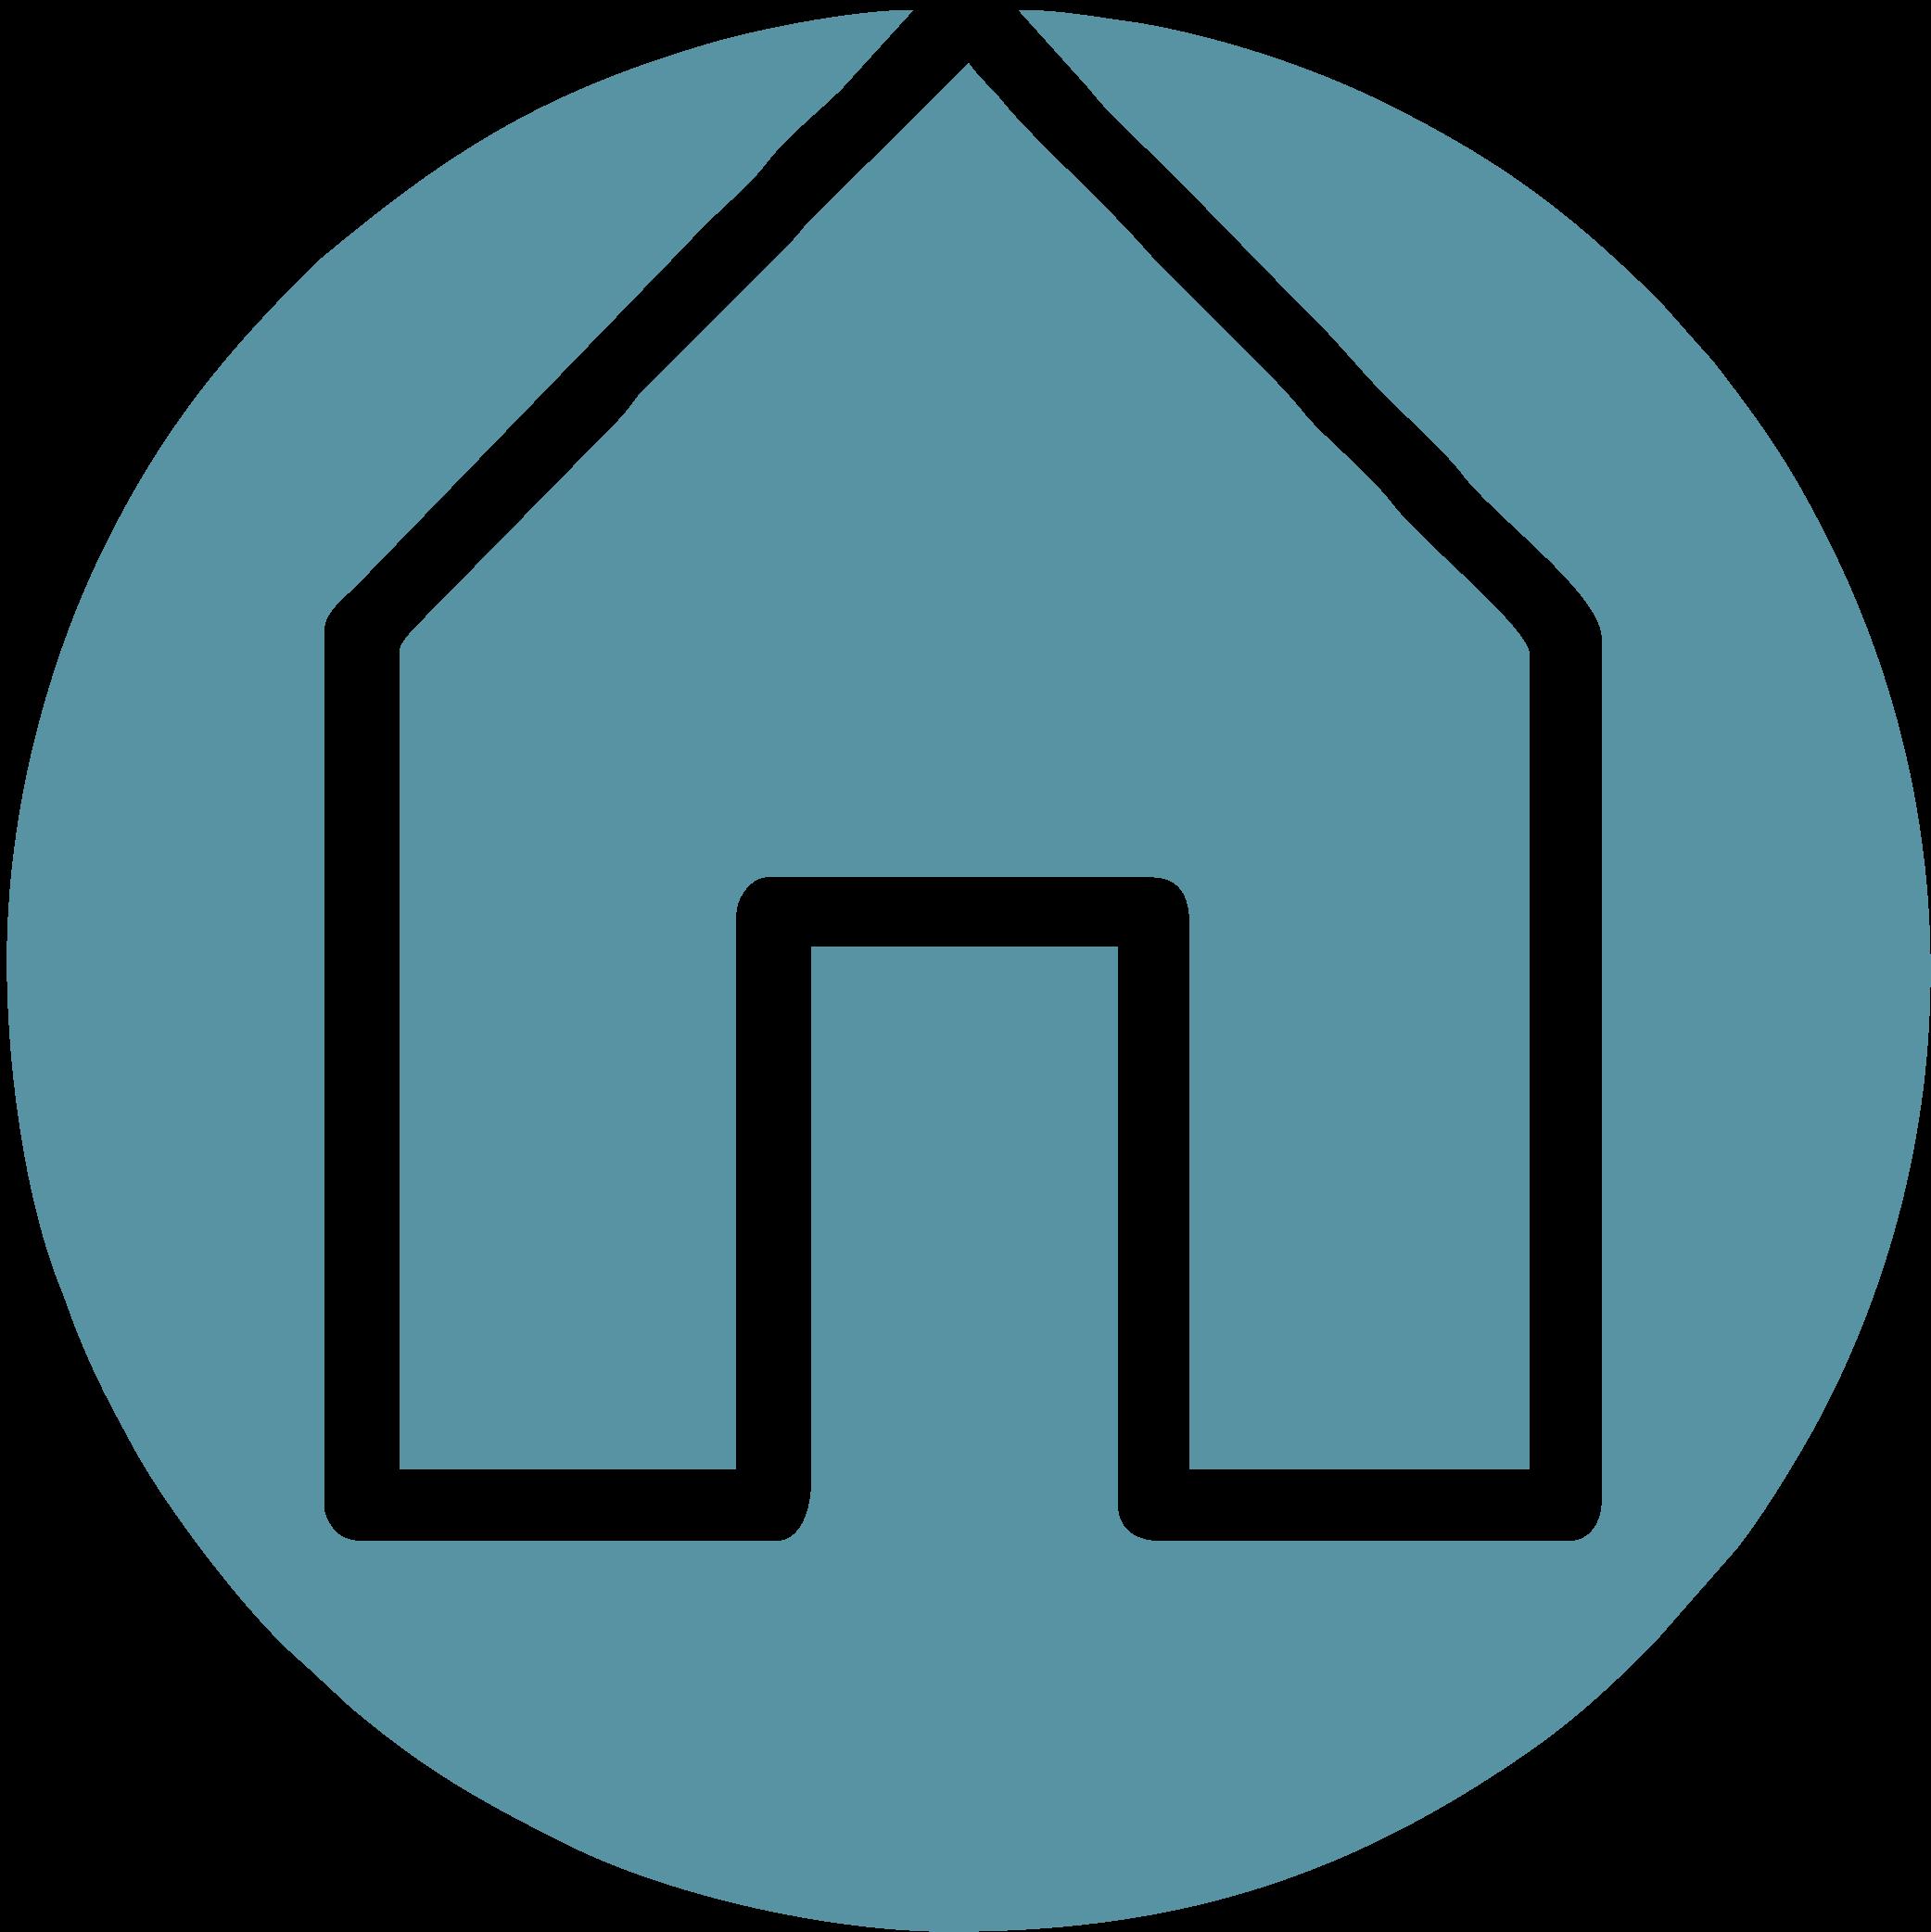 Werkterrein-kwartiermakers-icon-home-kwartiermakers